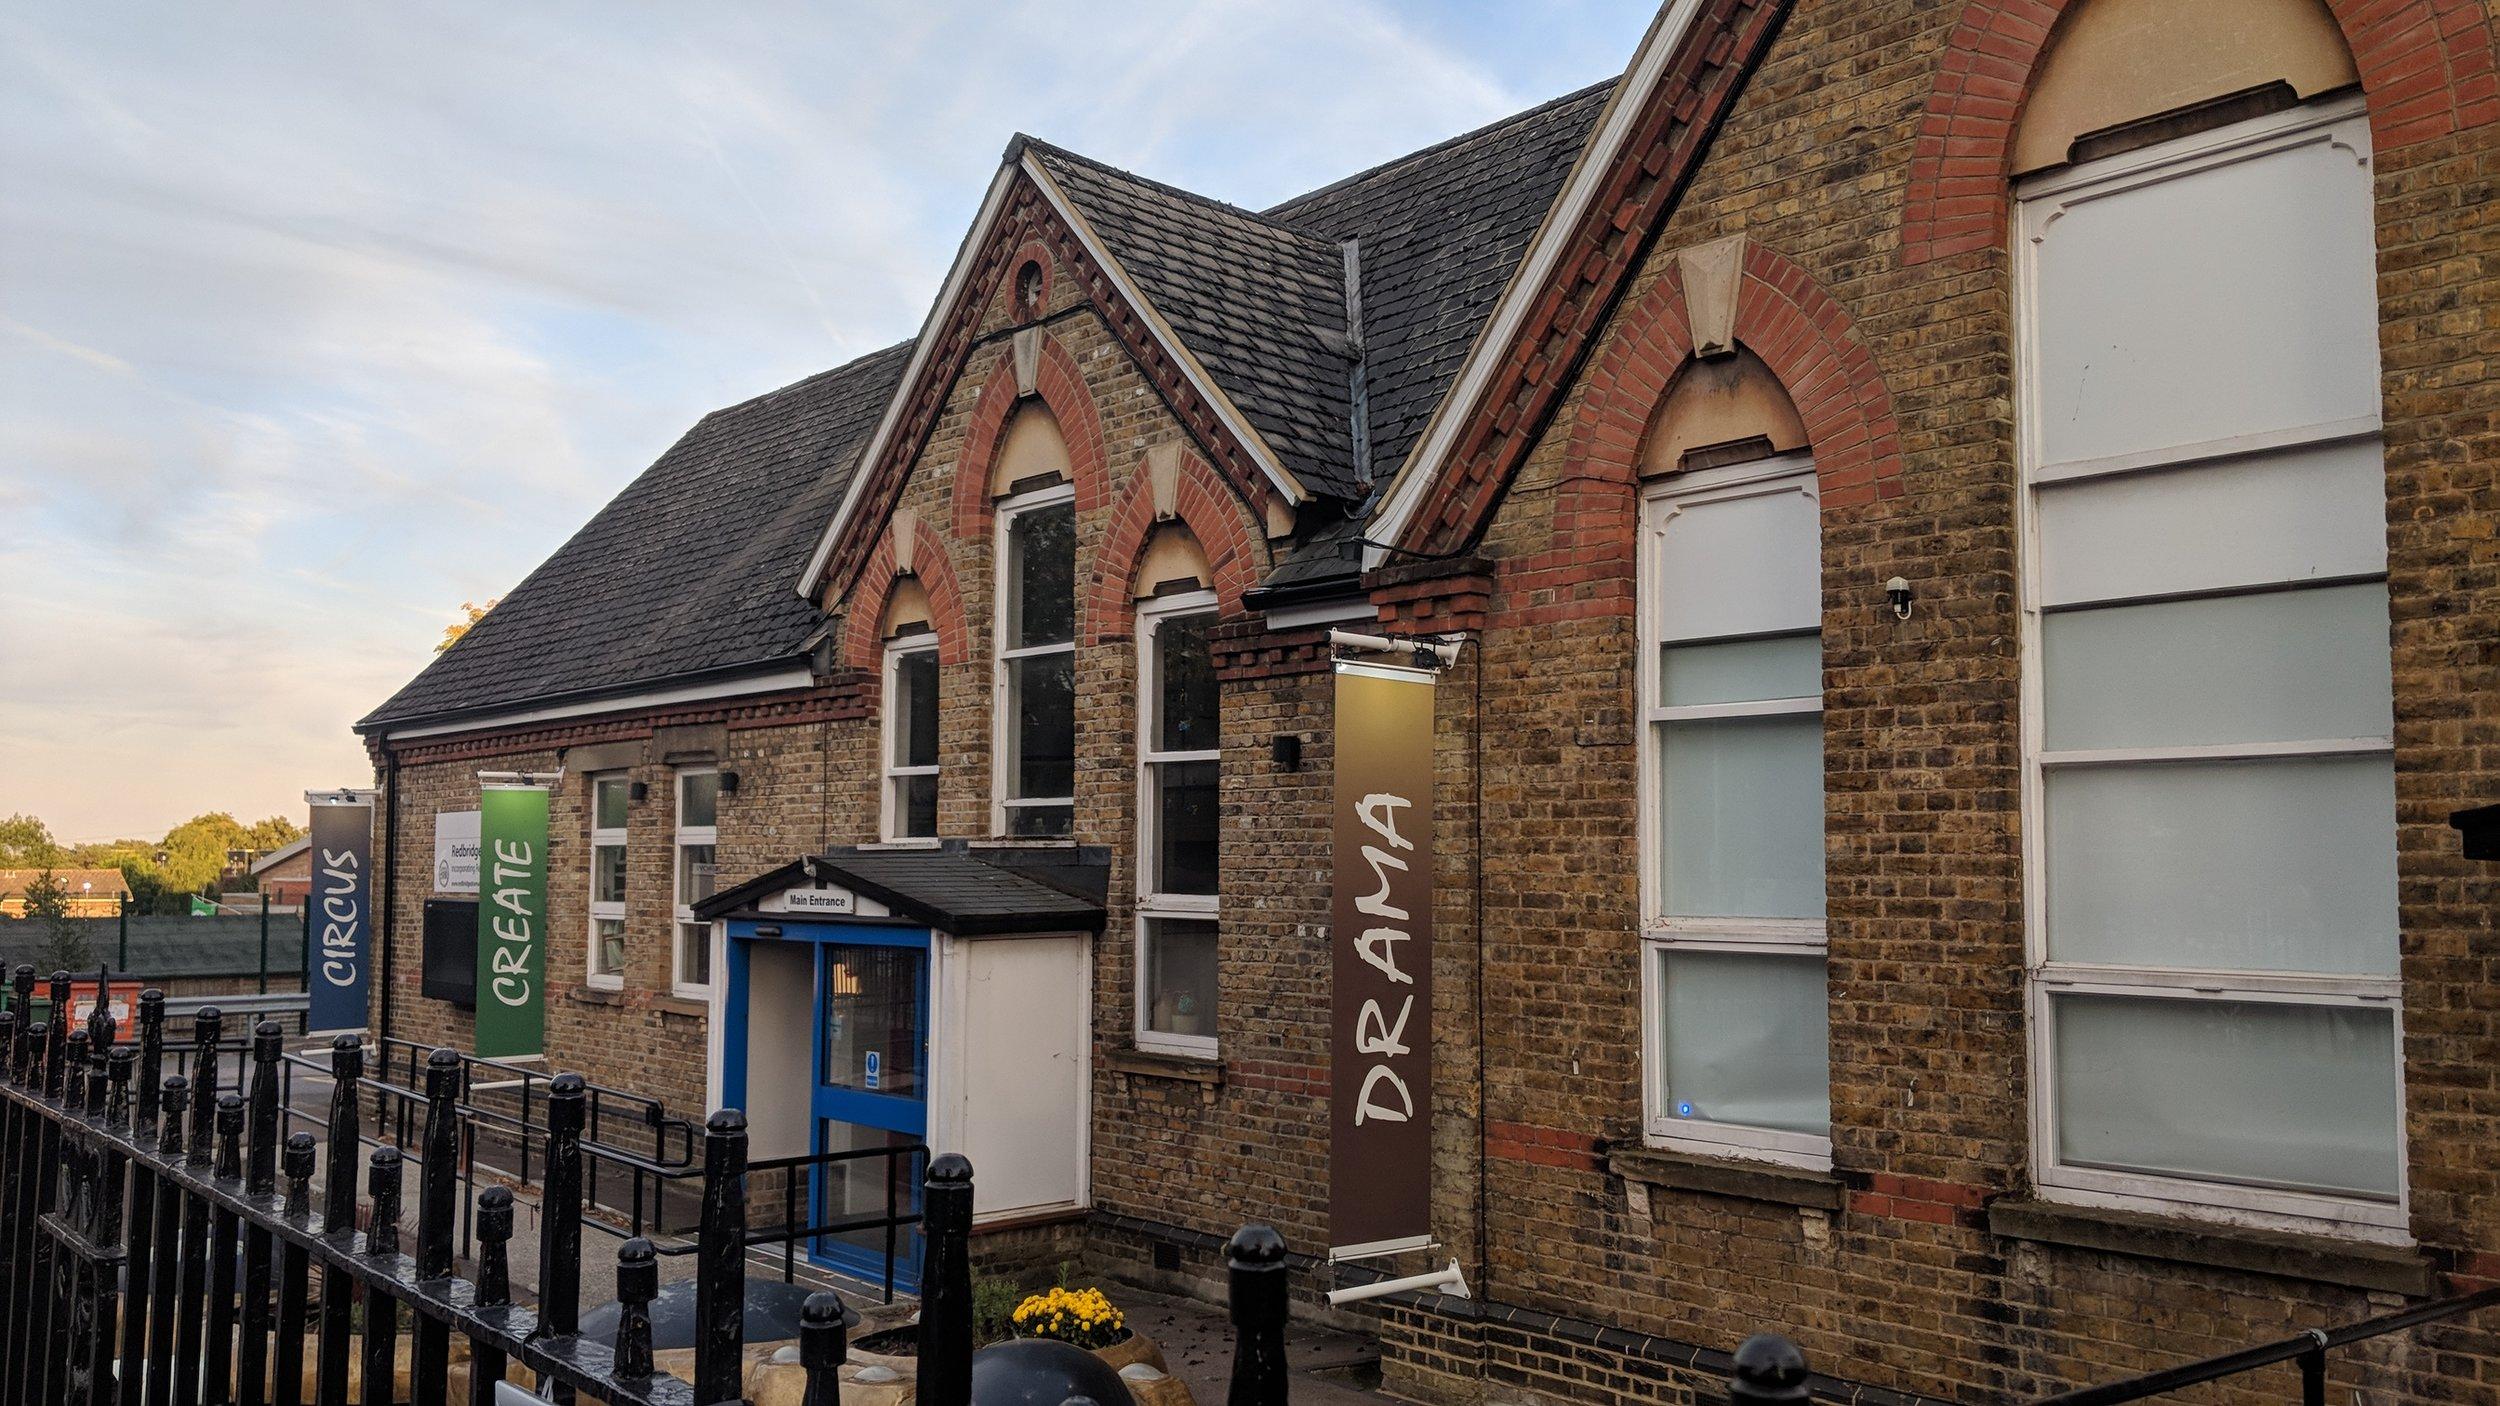 Redbridge Drama Centre - visited 24/08/2019